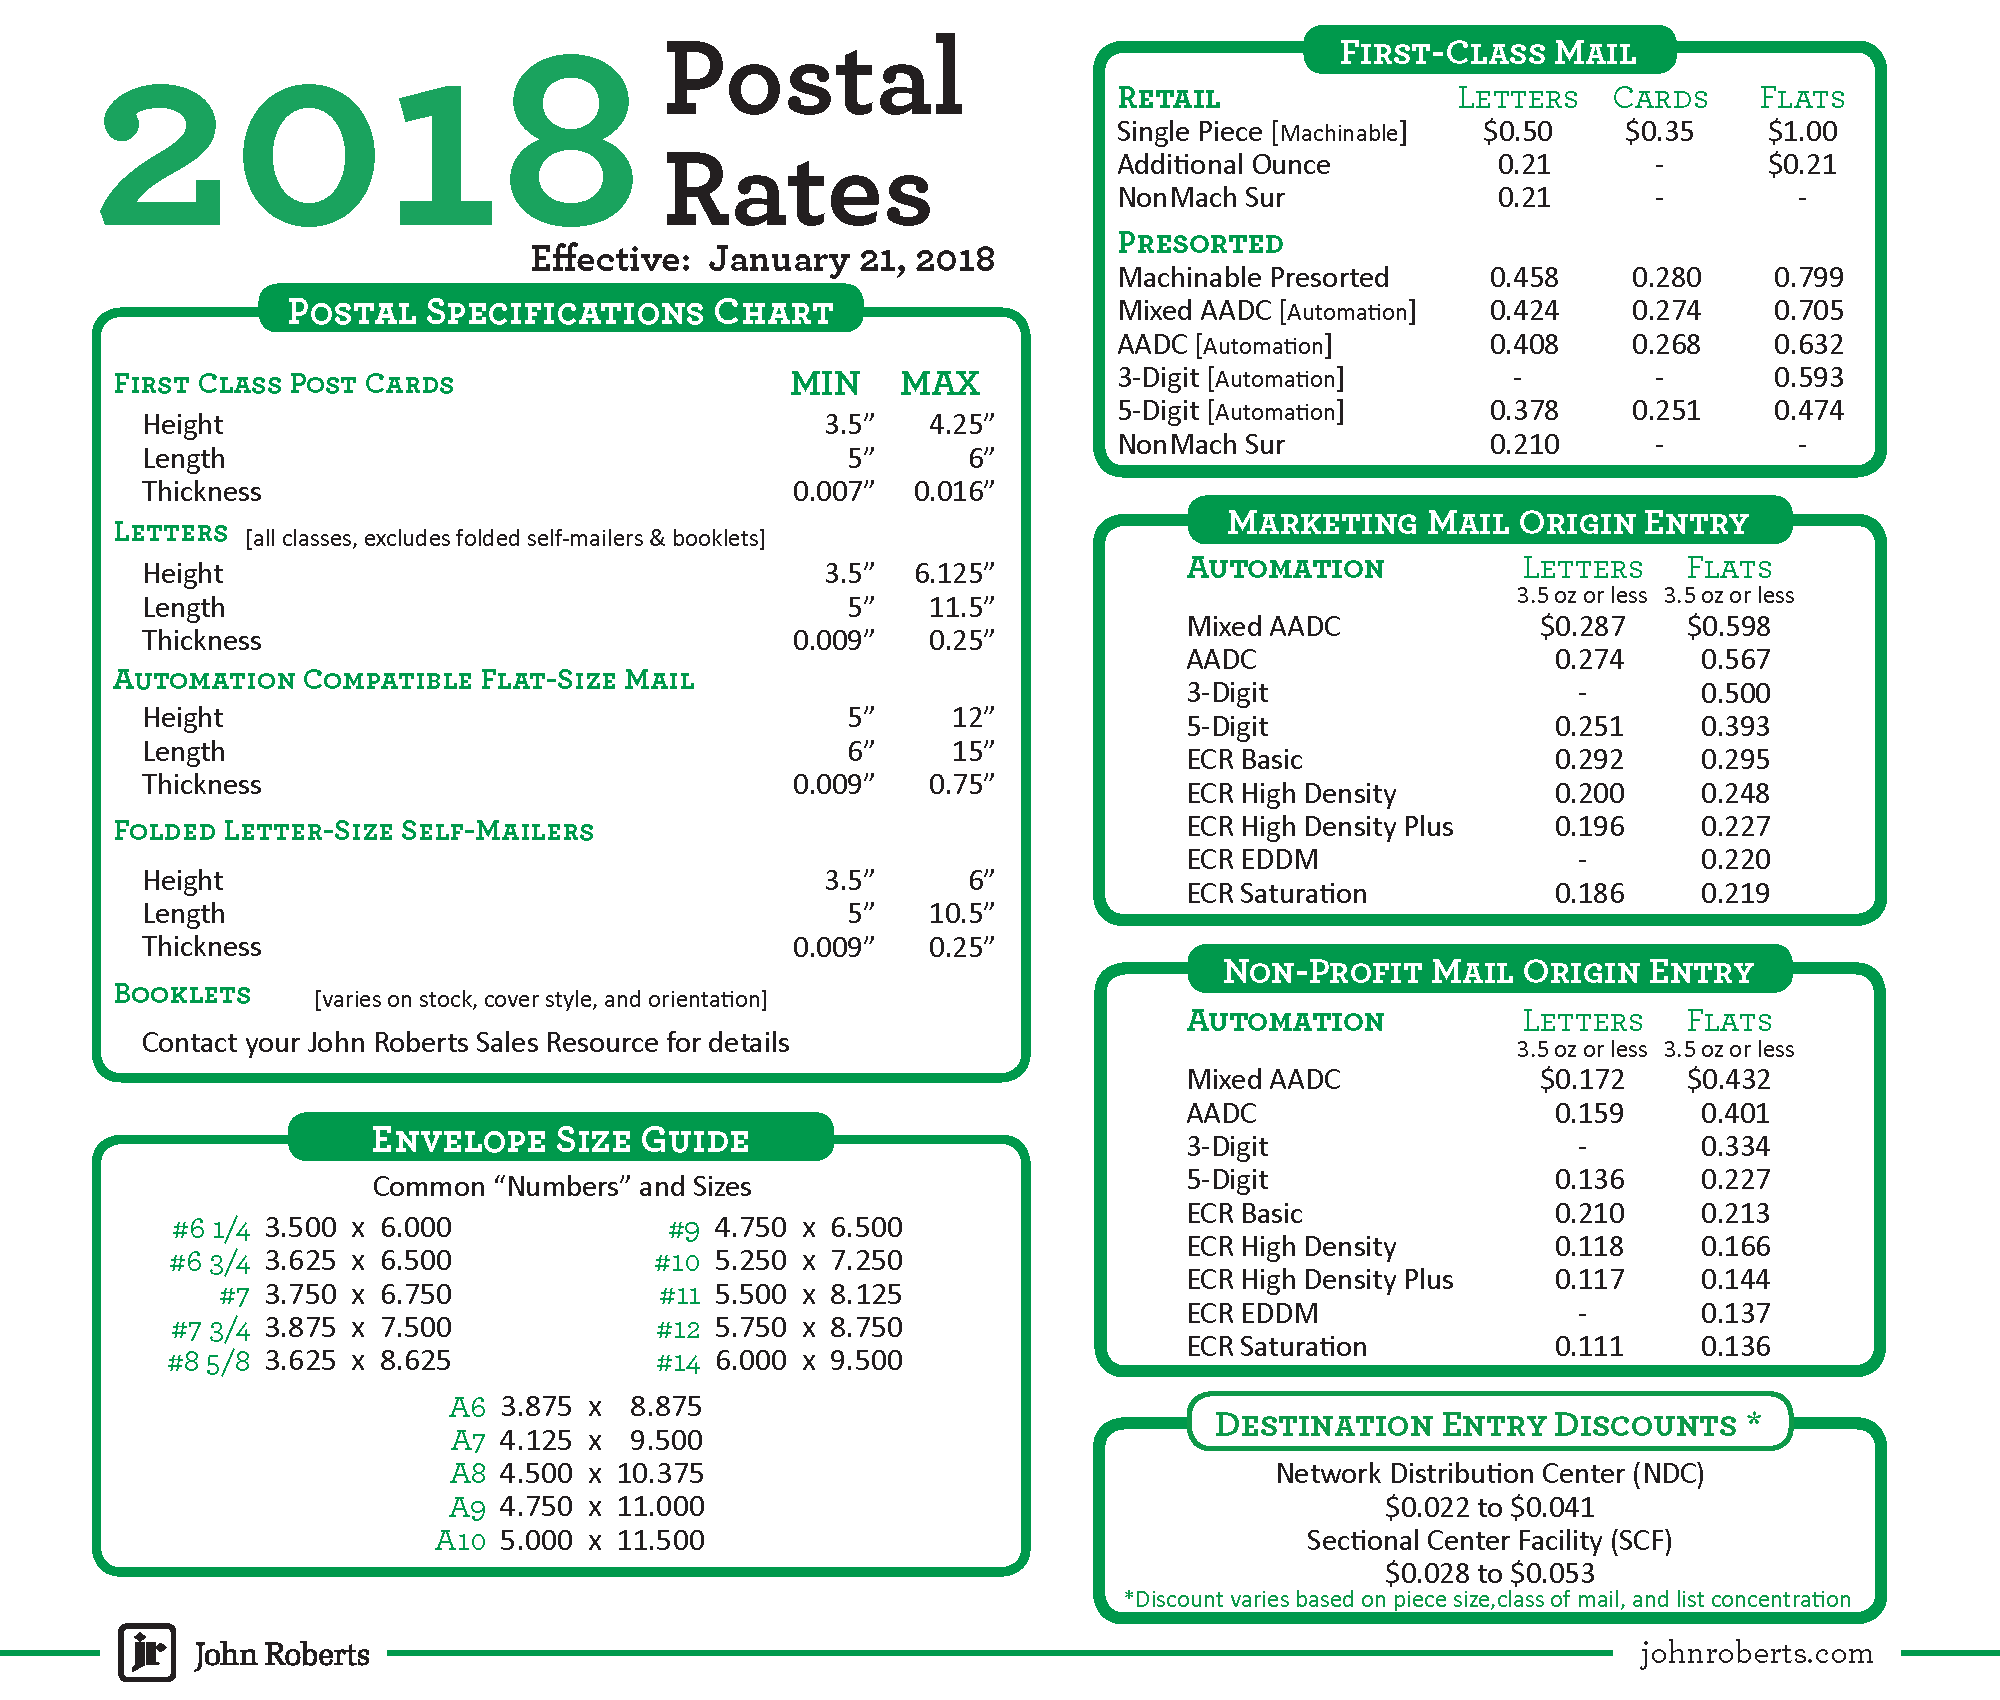 usps postal rate chart free download | john roberts